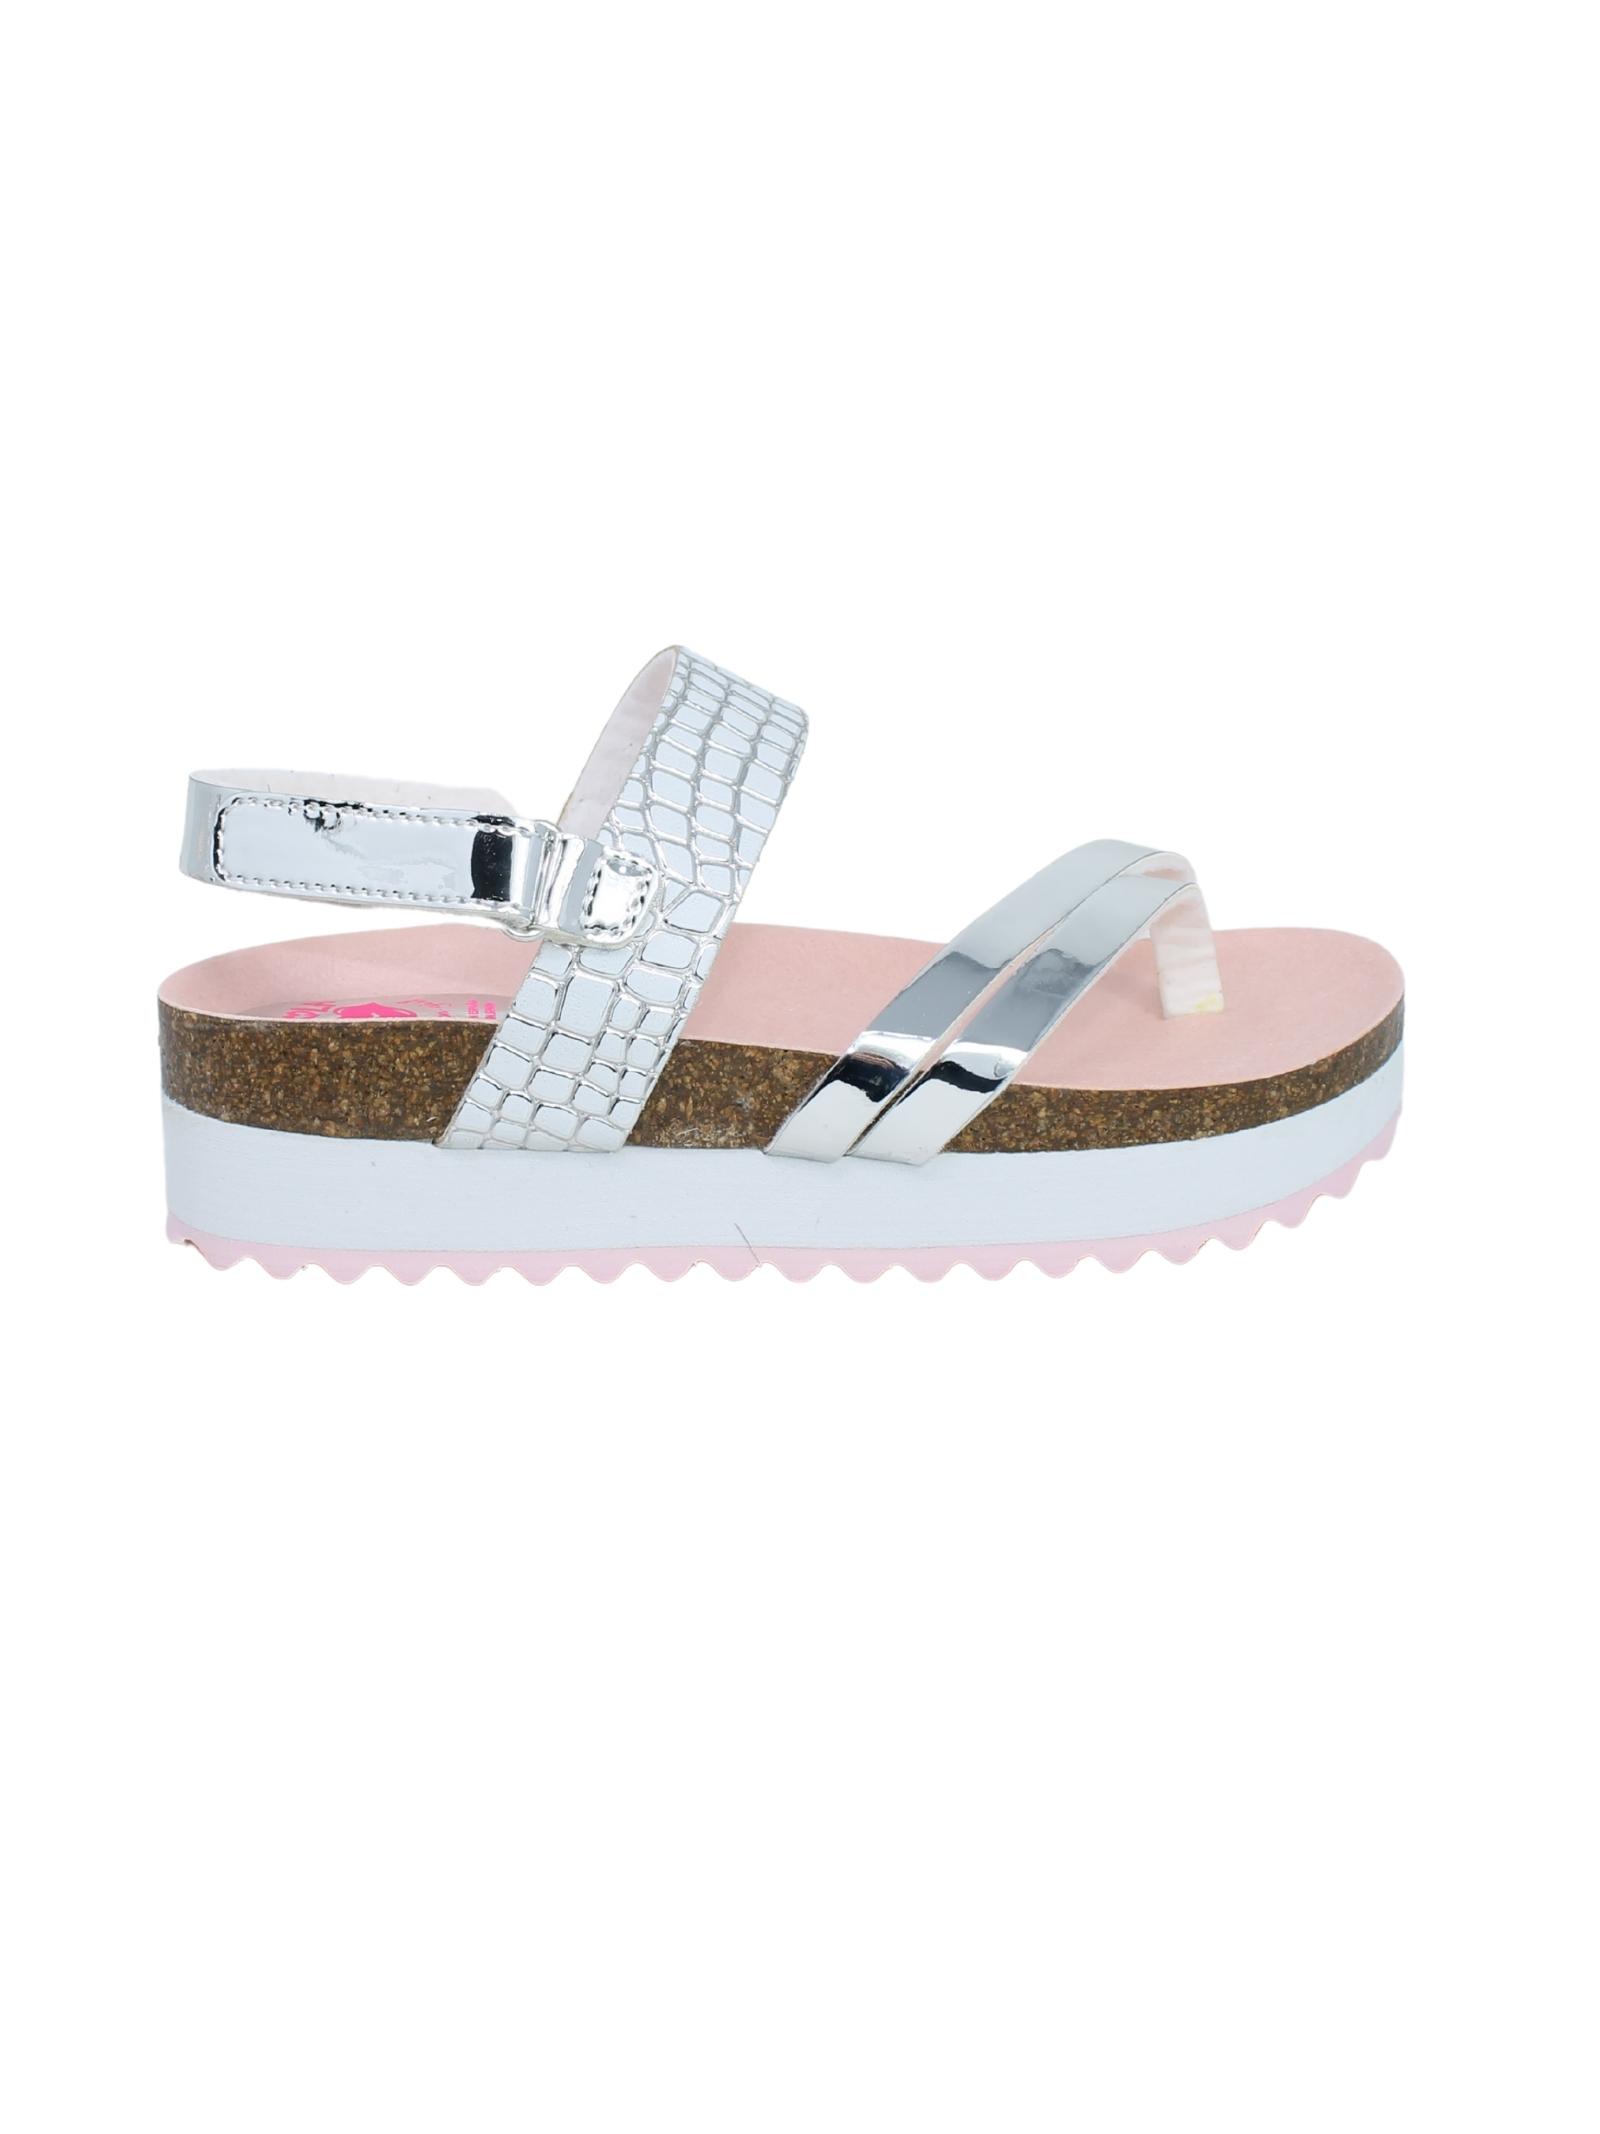 Sandalo Bambina Serpentato PABLOSKY | Sandali | 858850BIANCO